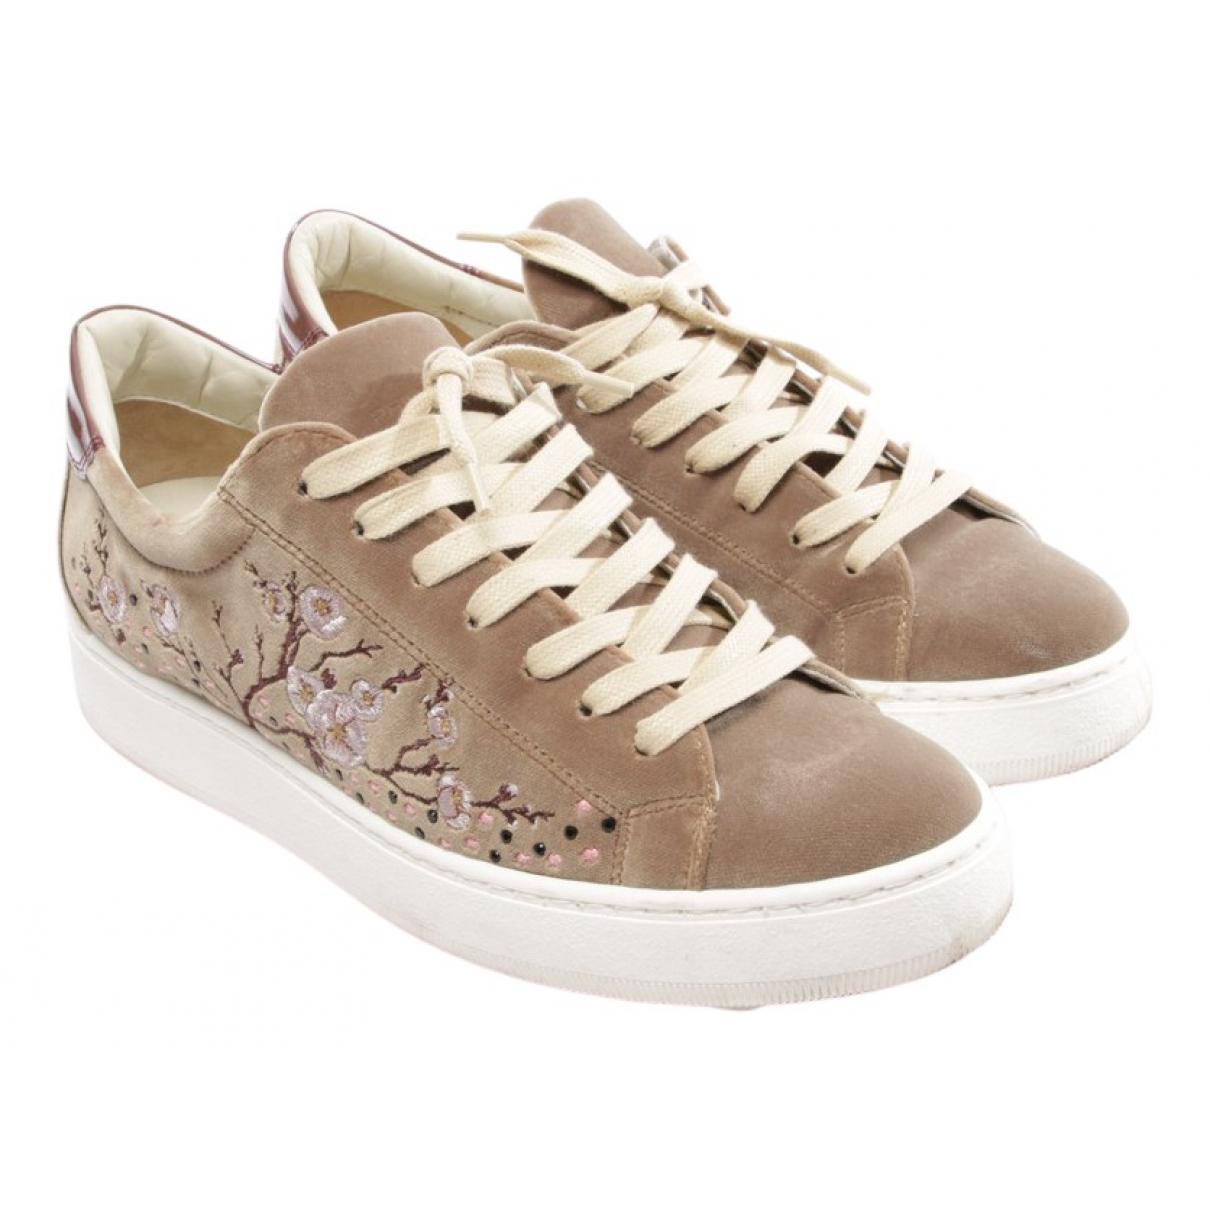 Philippe Model \N Beige Leather Flats for Women 40.5 EU